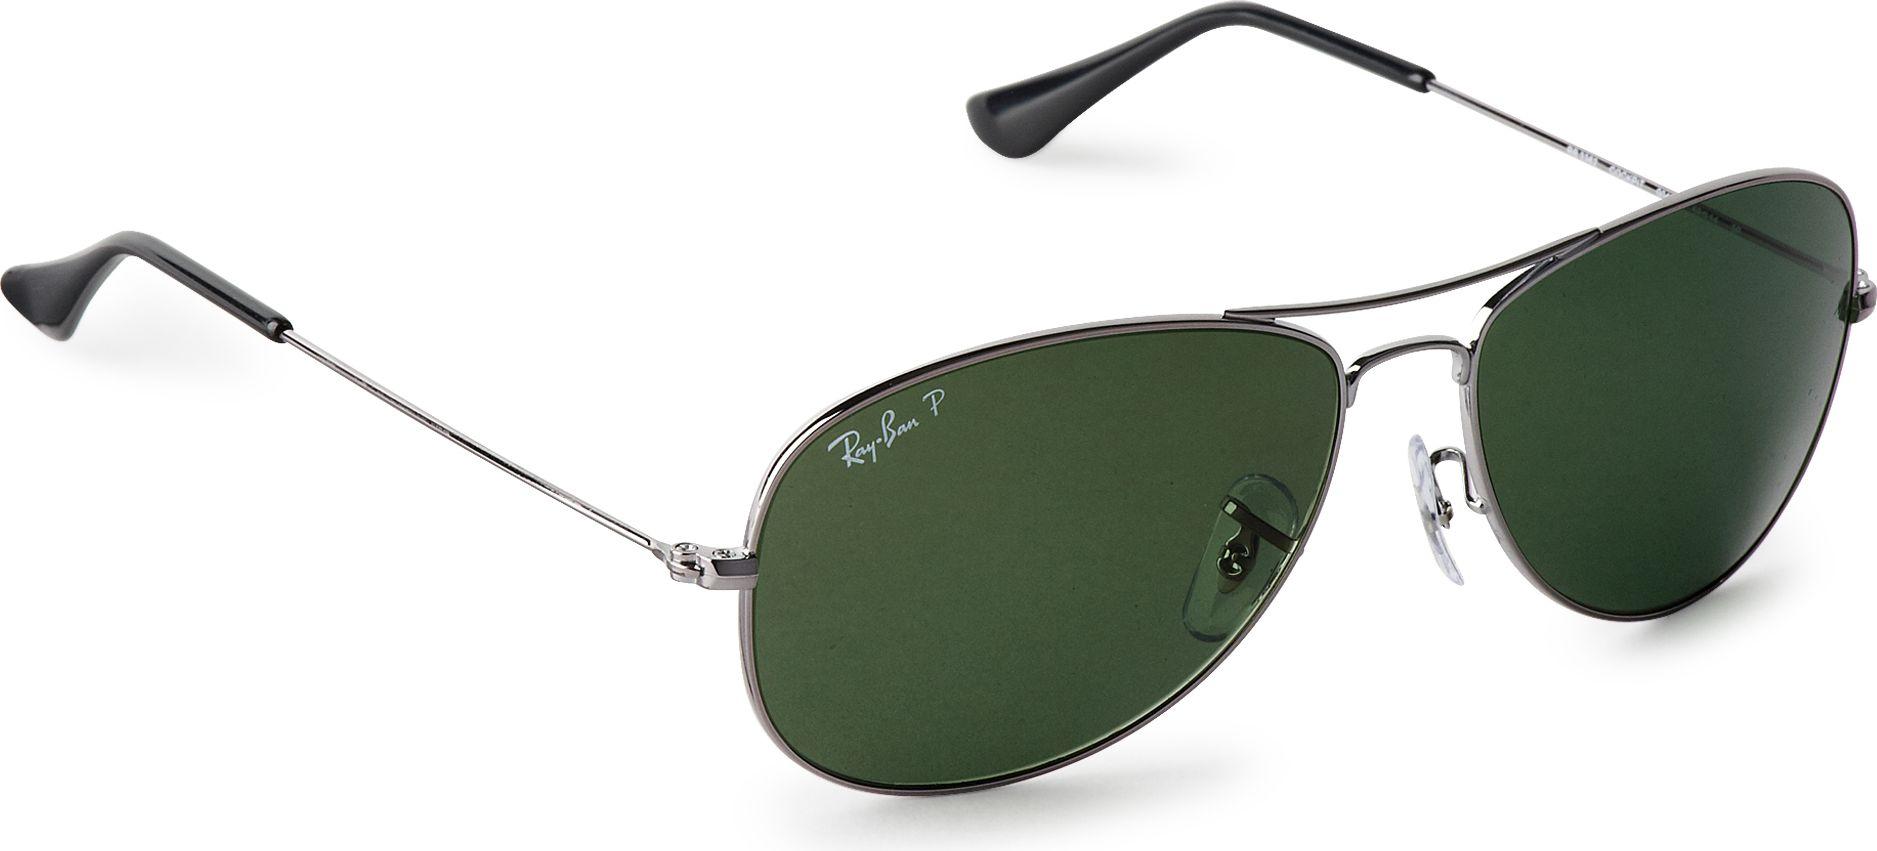 Ray Ban Aviator Sunglasses In Green For Men Gunmetal Lyst